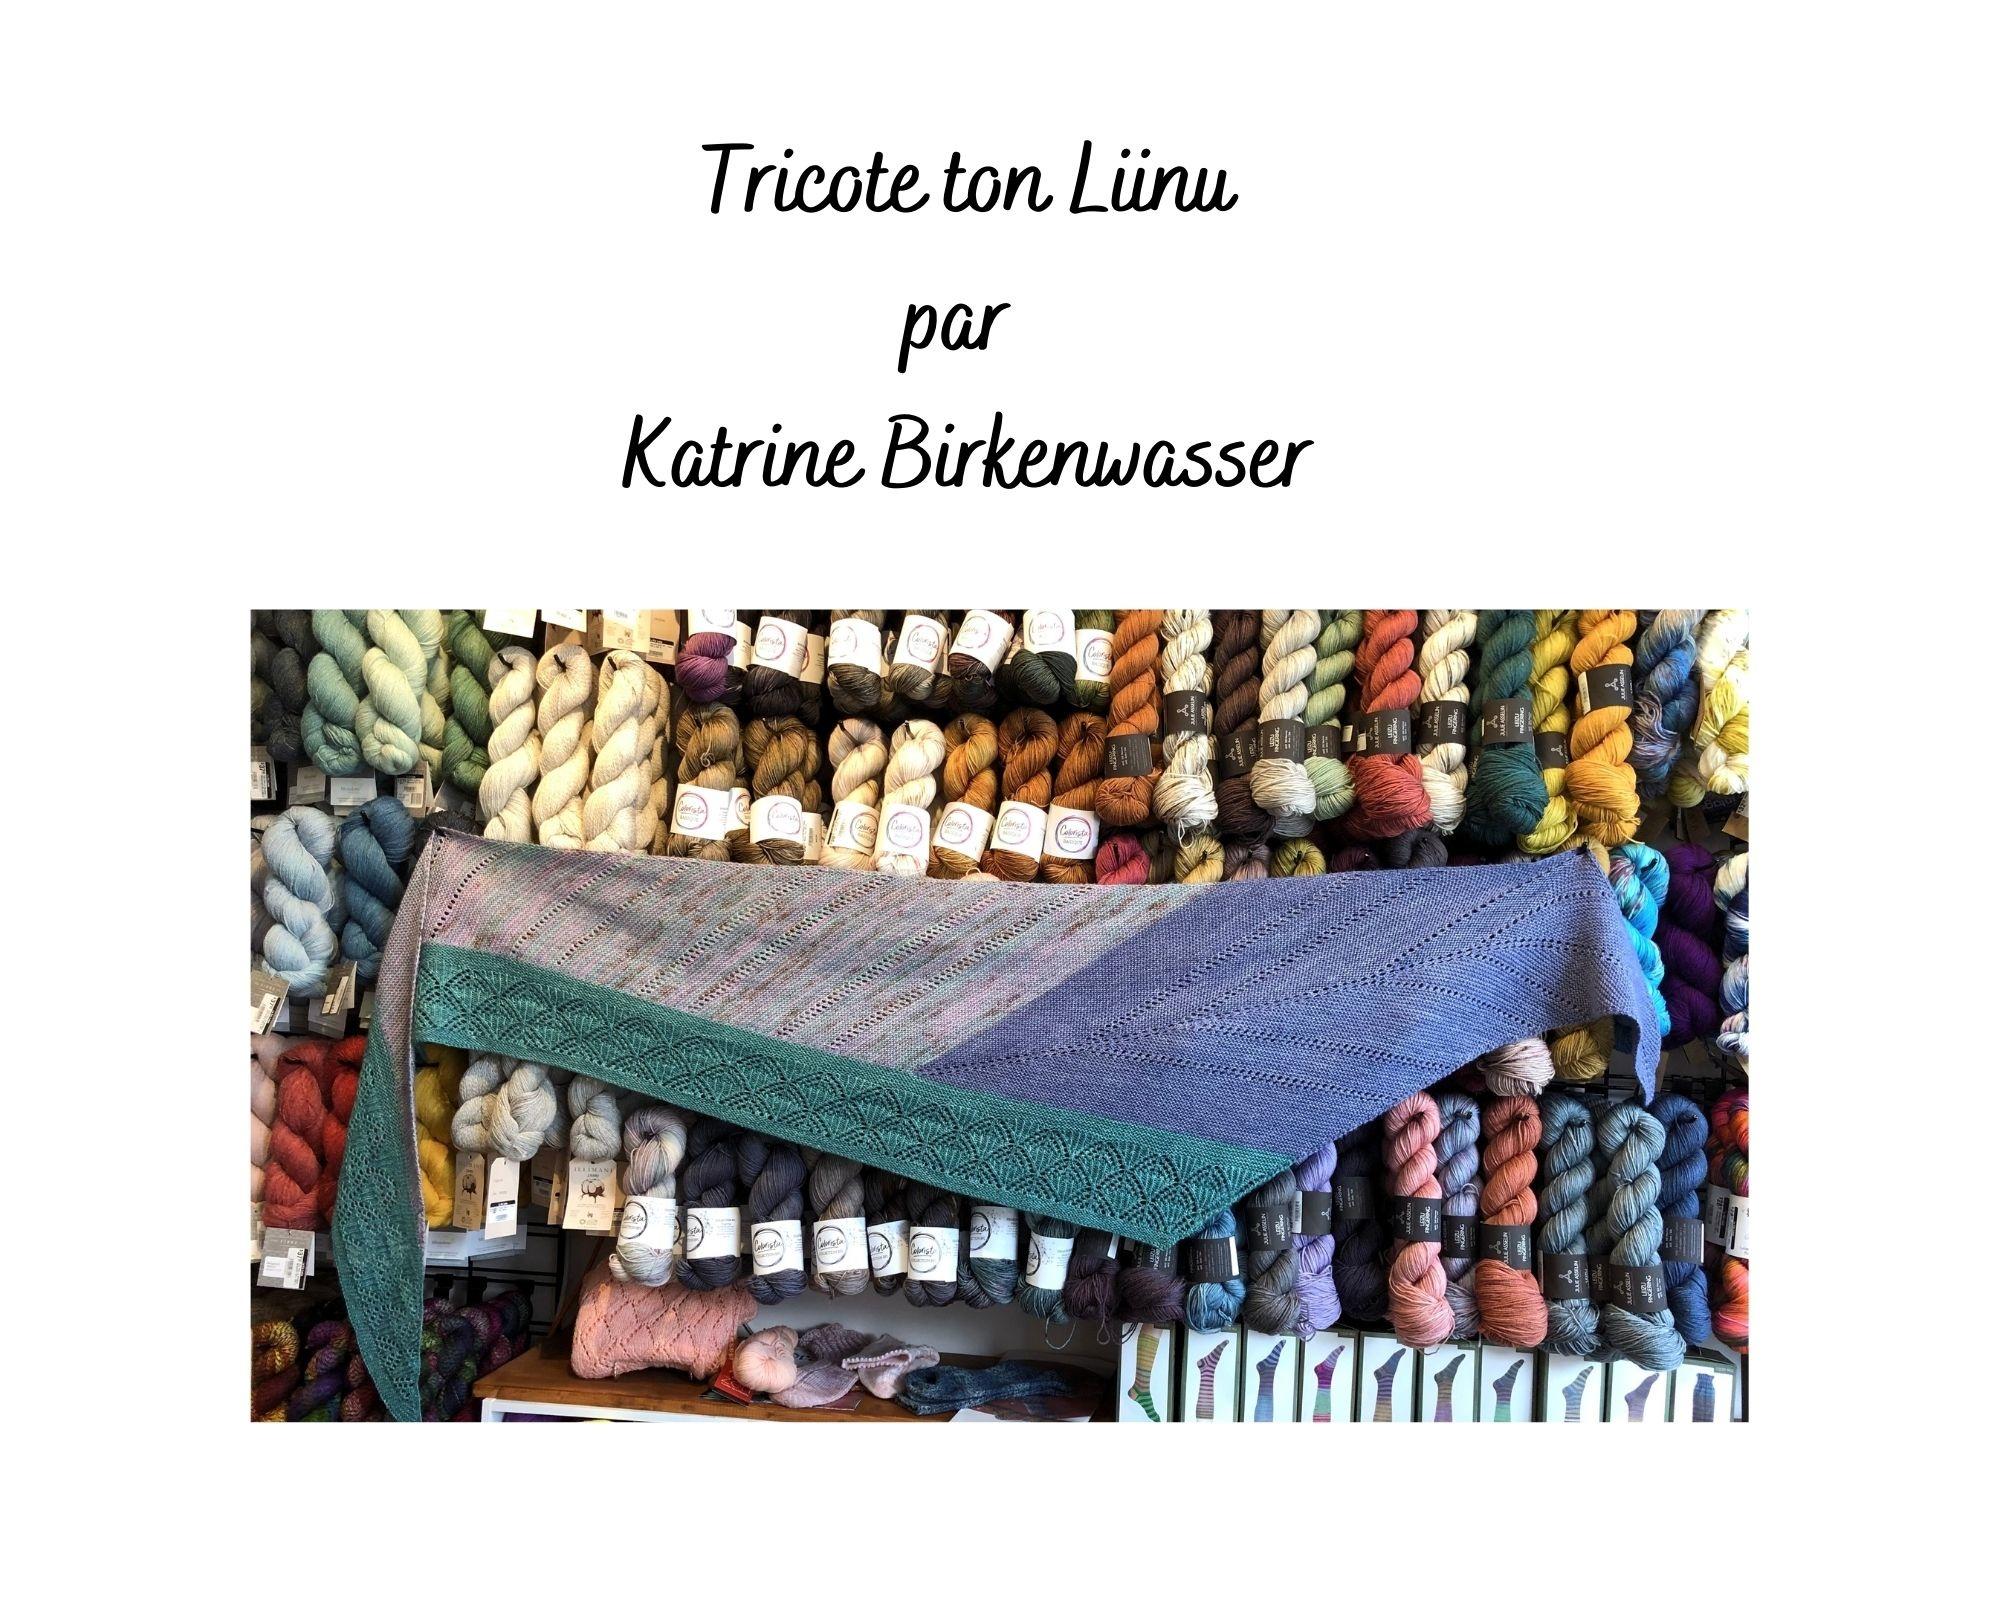 Tricote ton Liinu